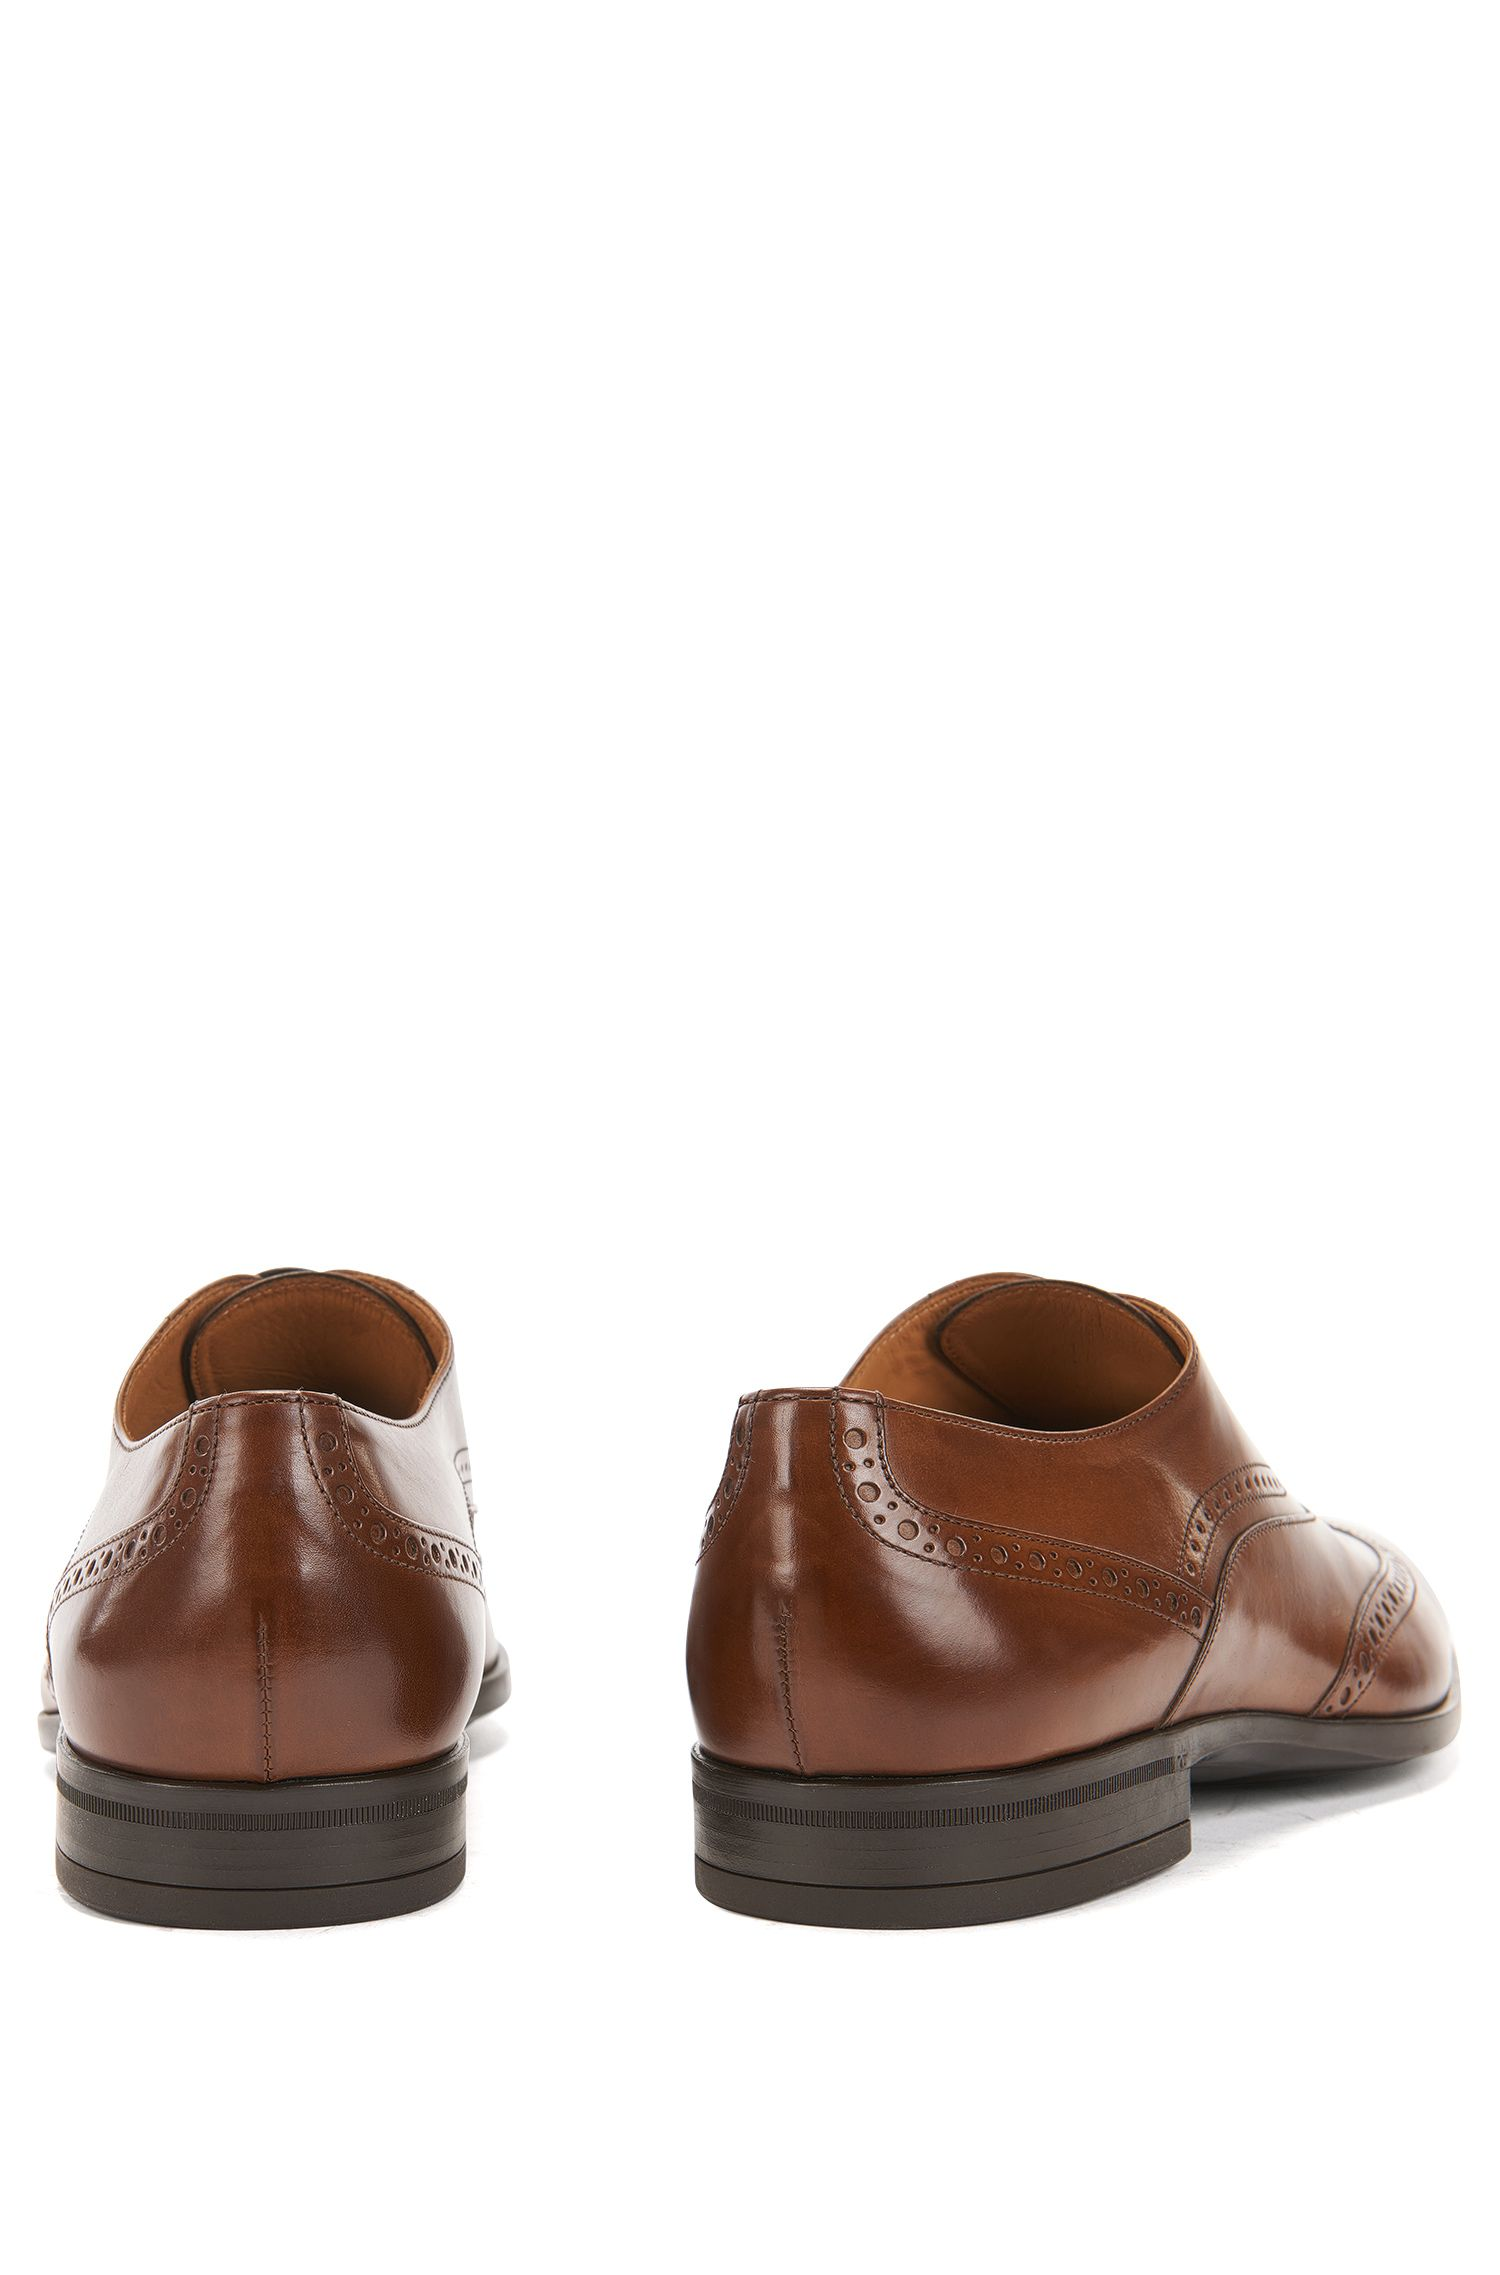 Oxford-Schuhe aus poliertem Leder mit Budapester-Details